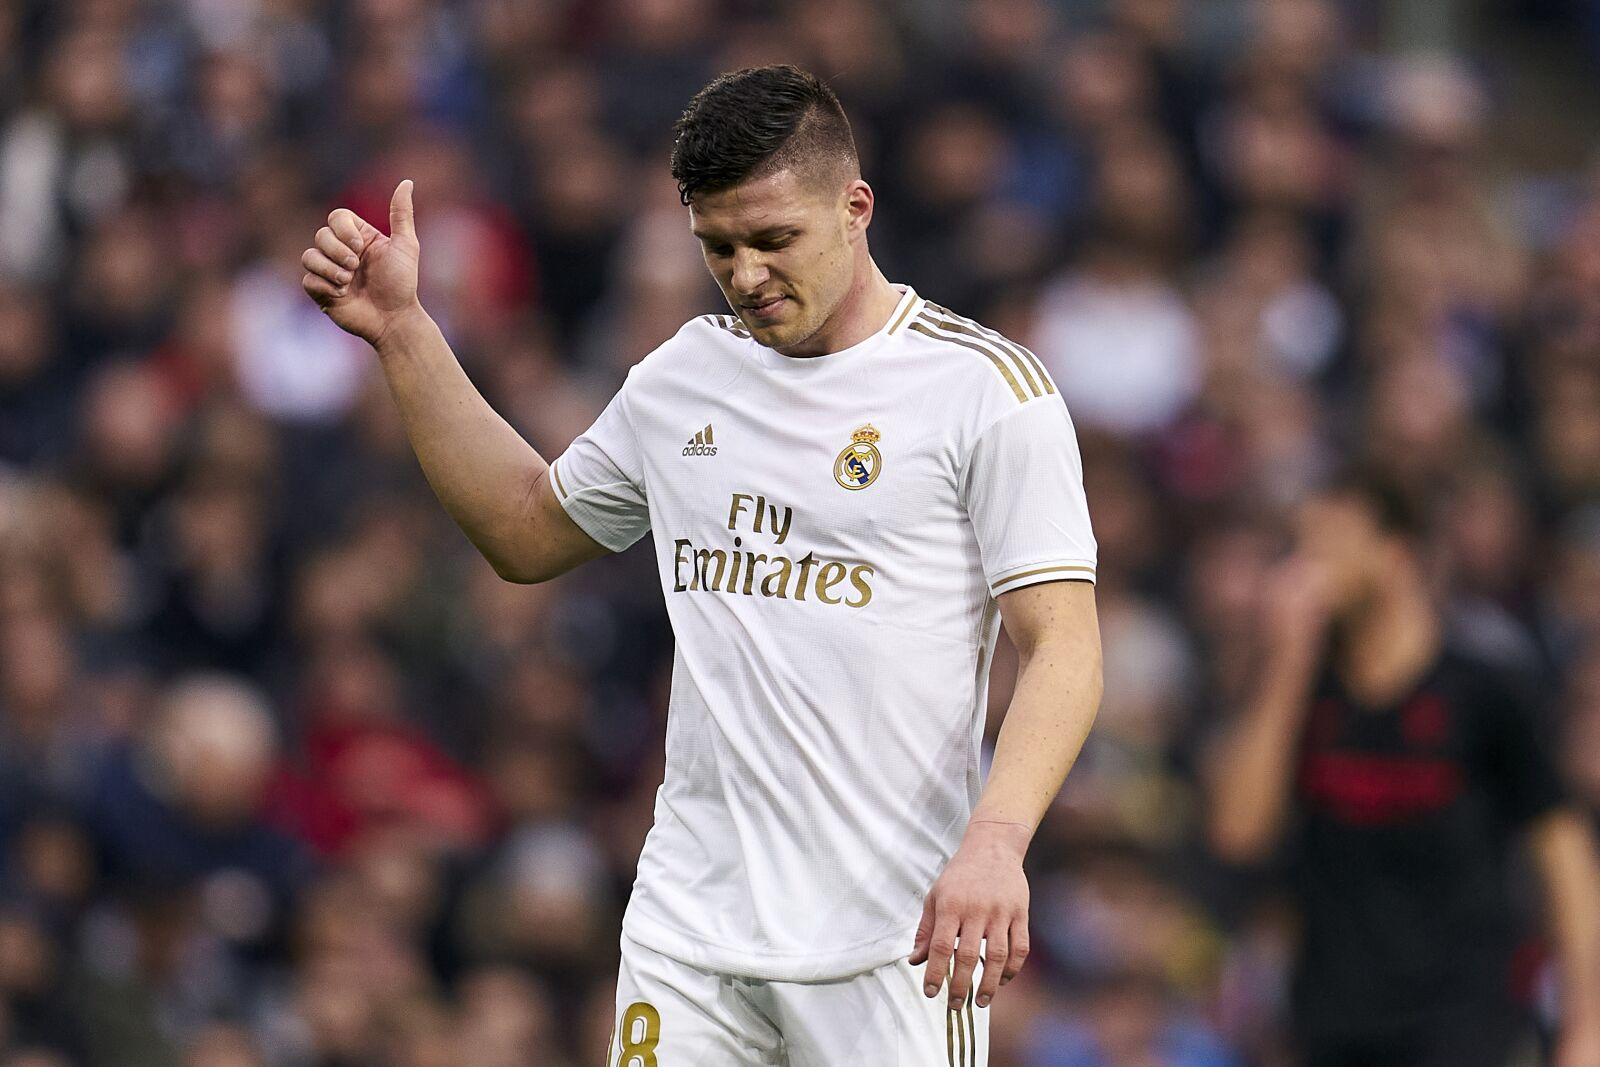 Real Madrid: Luka Jovic targeted as PSG's Edinson Cavani replacement?